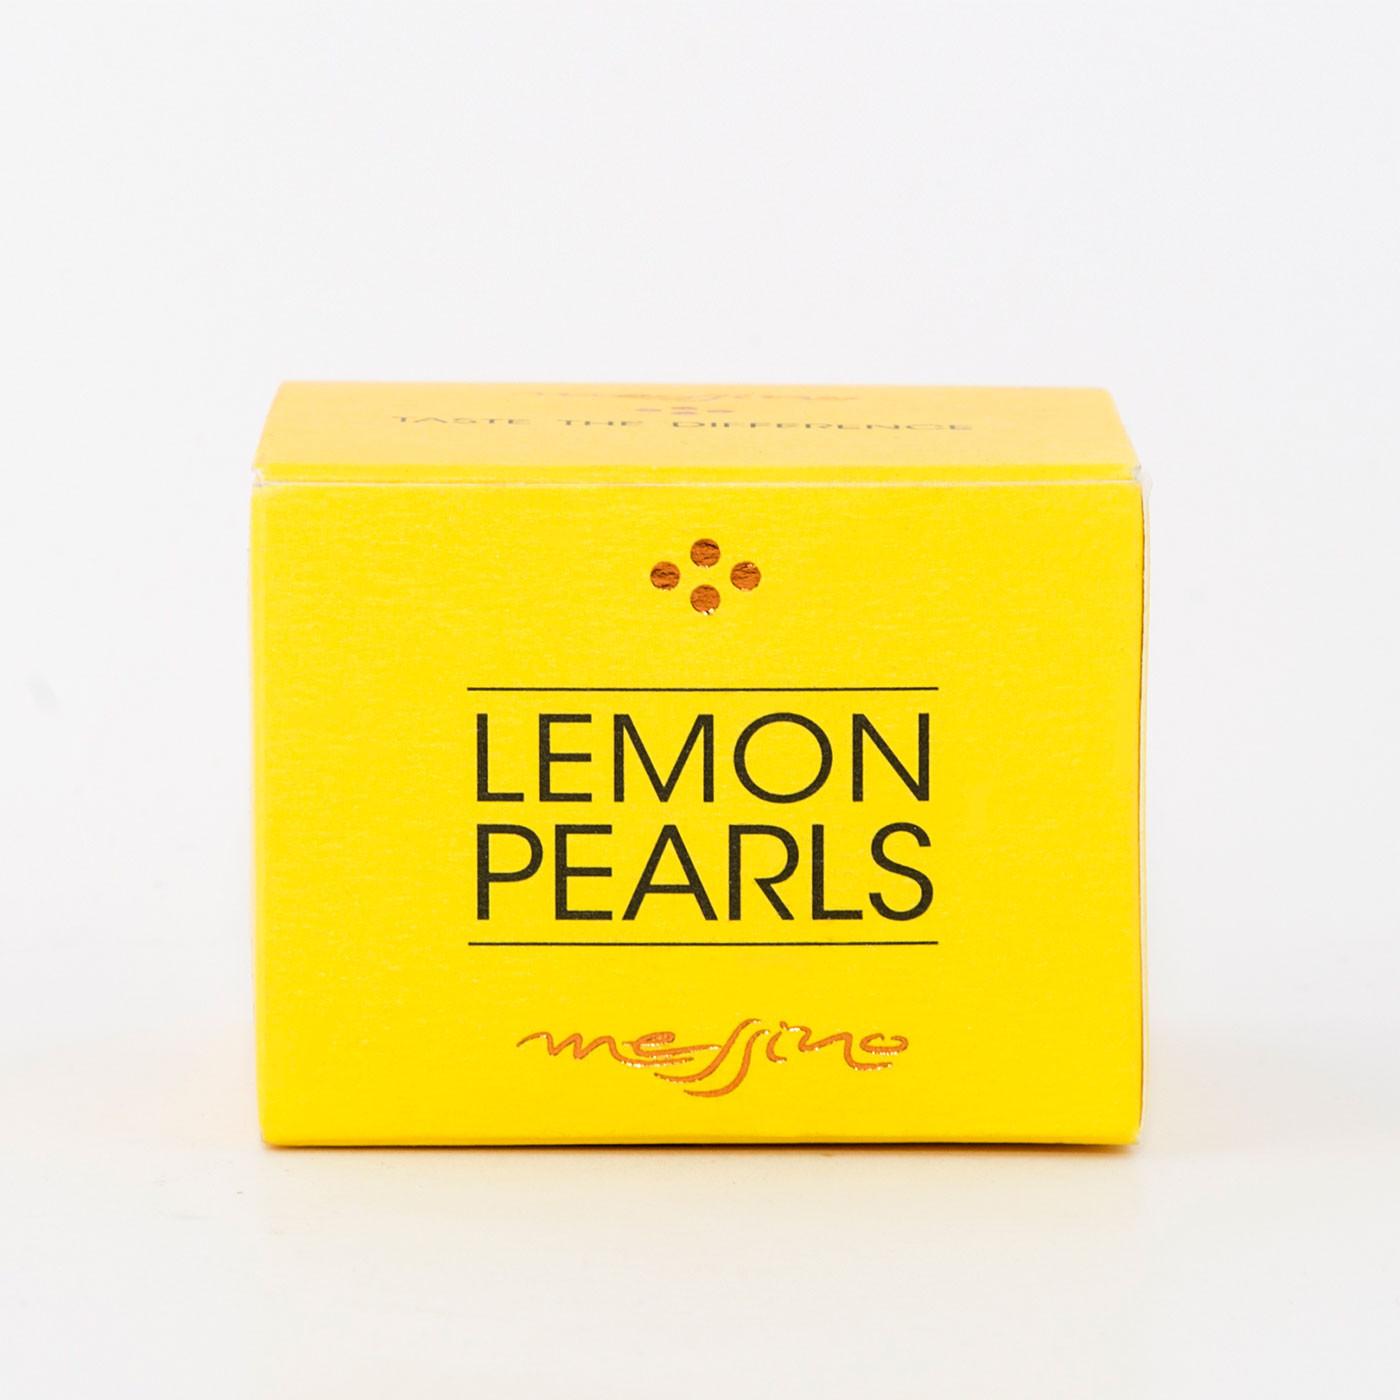 "Lemon pearls  ""messino"" 50 g"